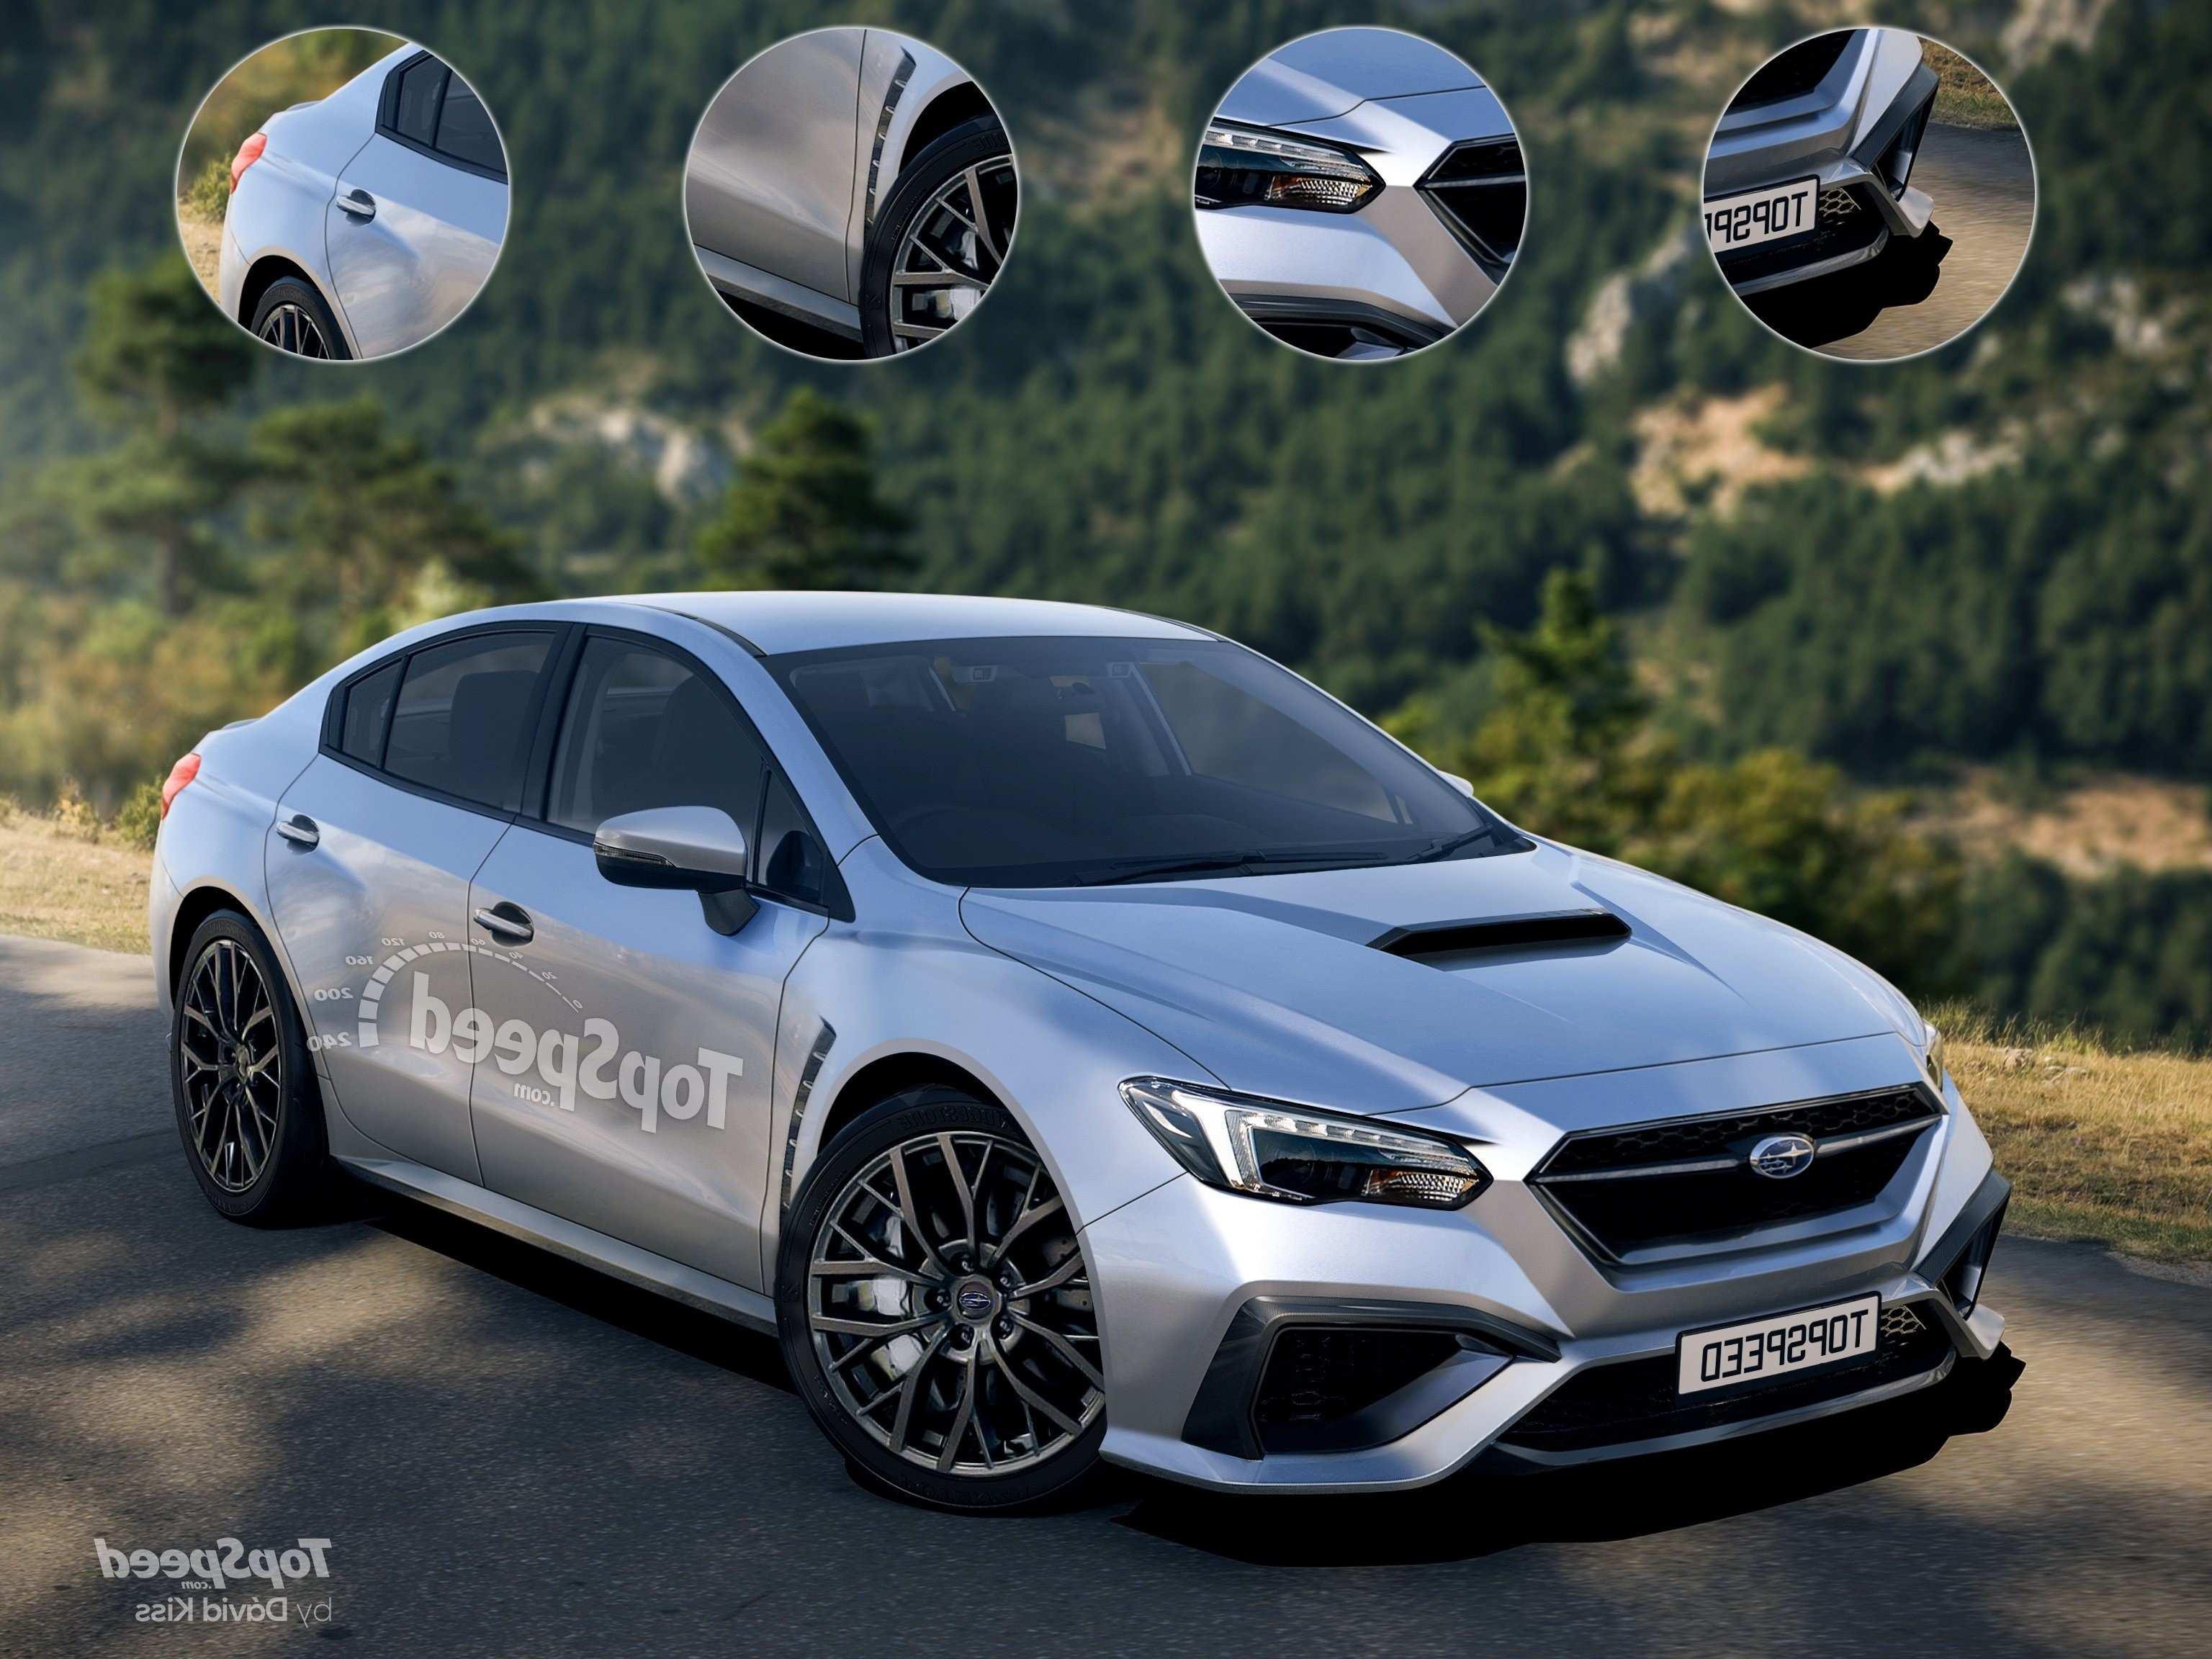 99 Gallery of 2020 Subaru Wrx Redesign Model with 2020 Subaru Wrx Redesign